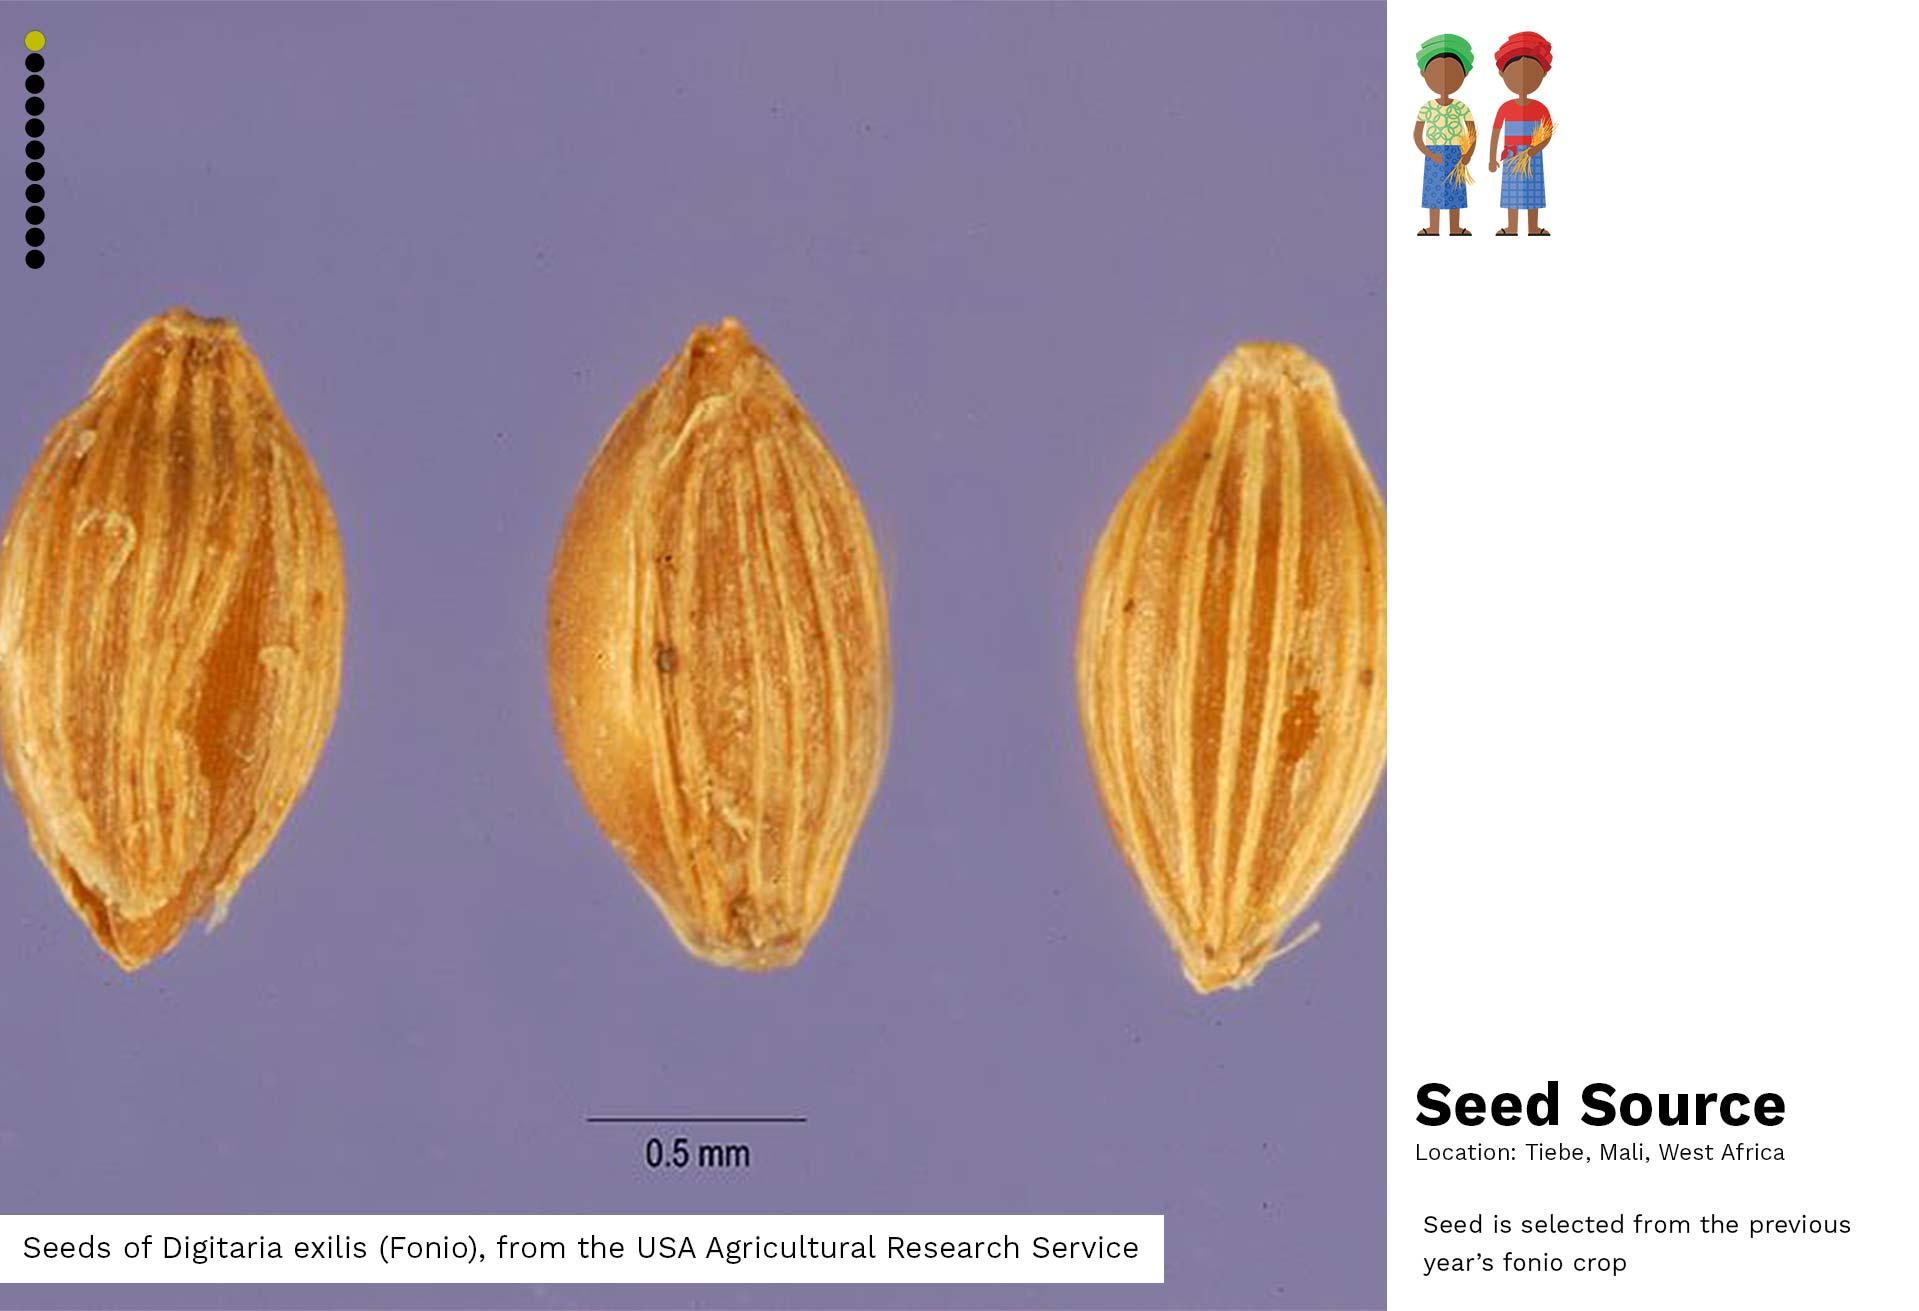 01-Seed Source